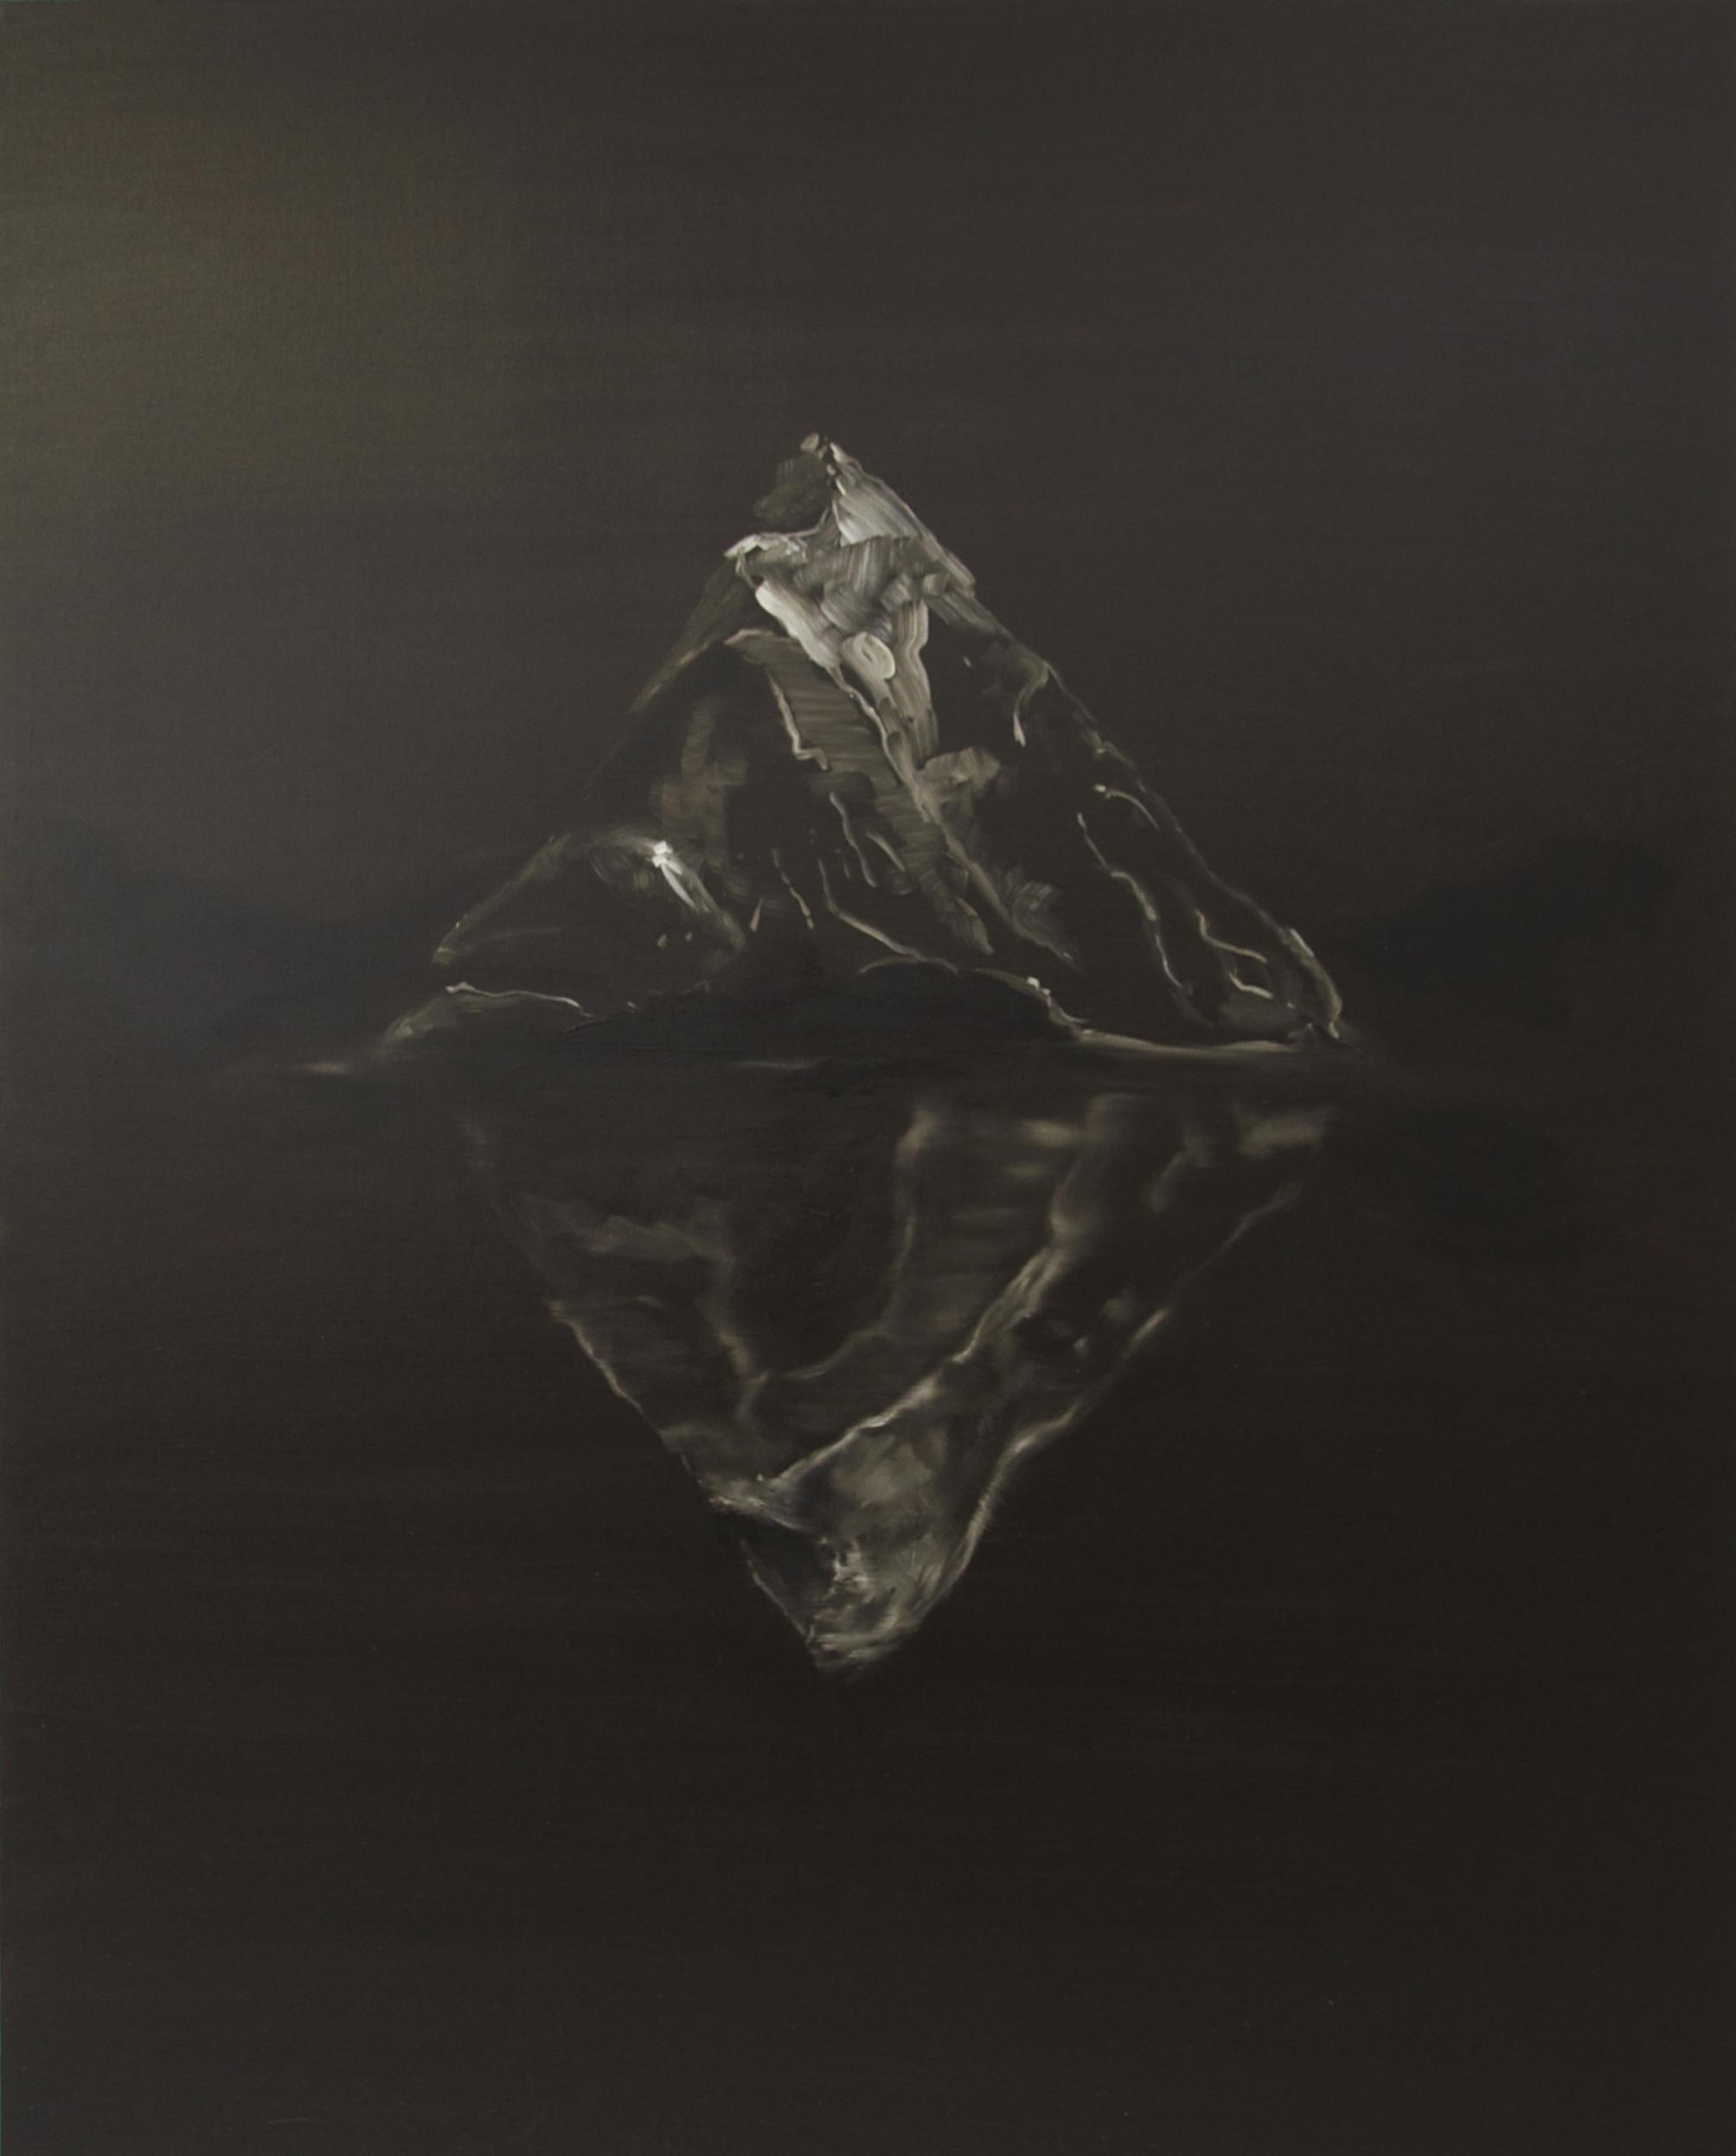 Stasis, 2013, Oil on canvas, 150 x 125 cm